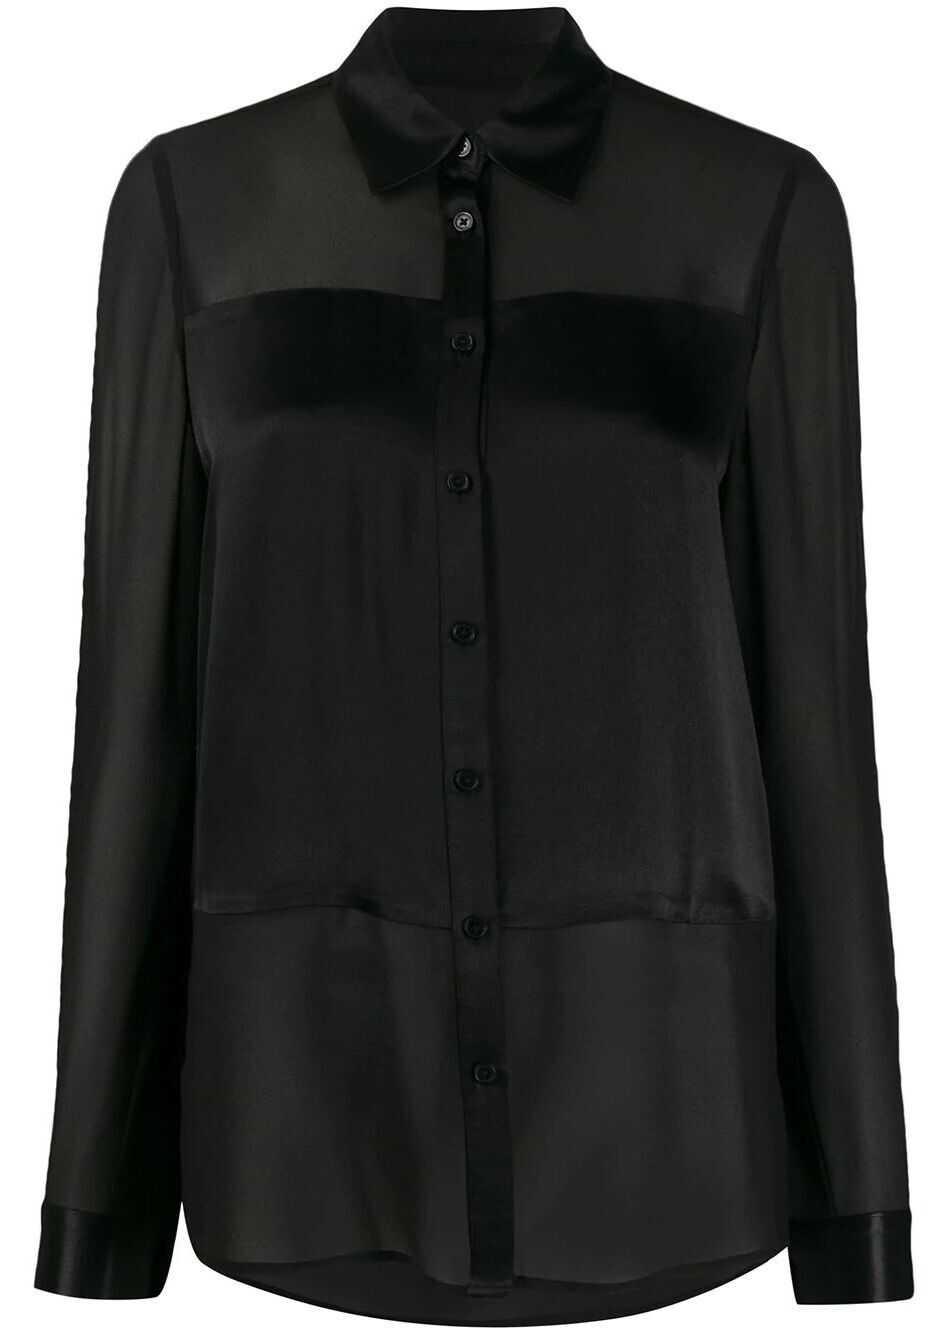 Michael Kors Viscose Shirt BLACK